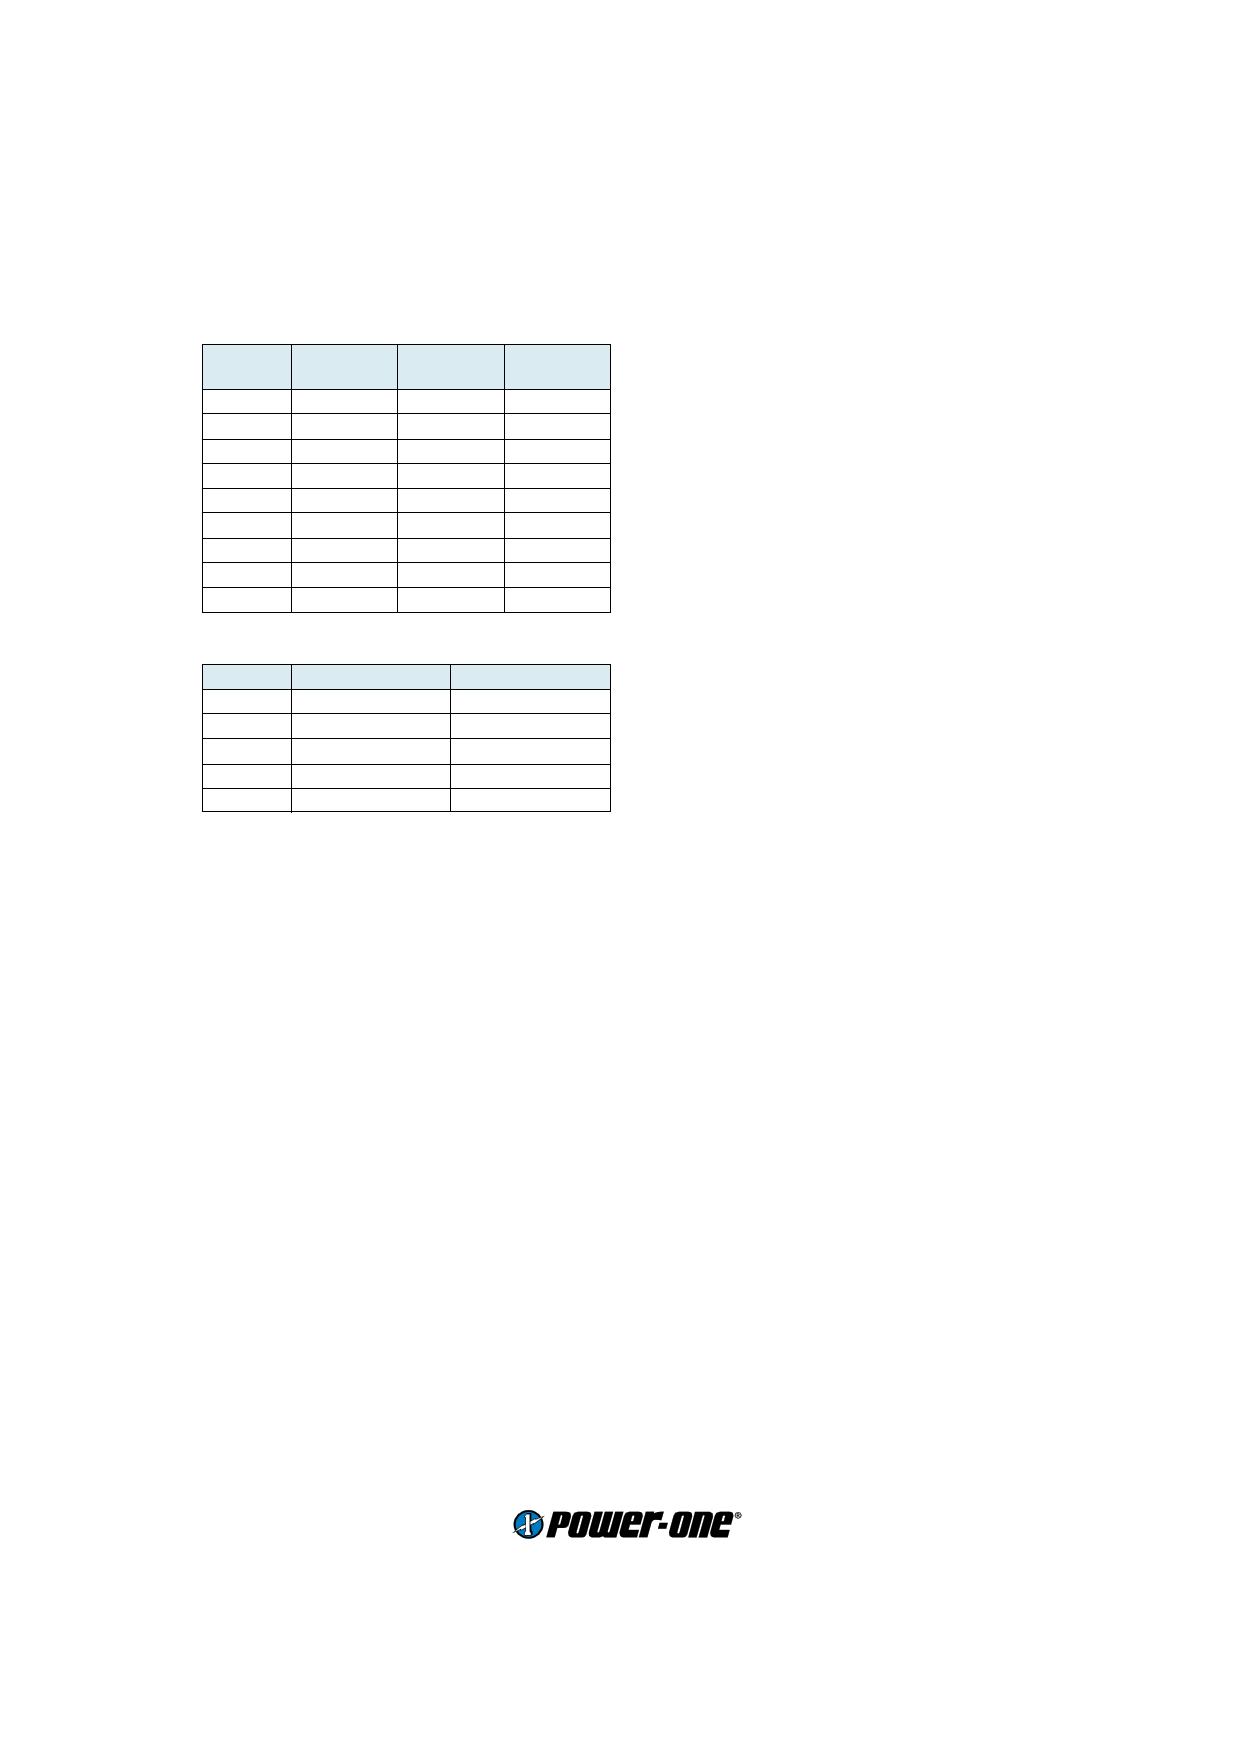 48IML10-0503-3 pdf, 반도체, 판매, 대치품